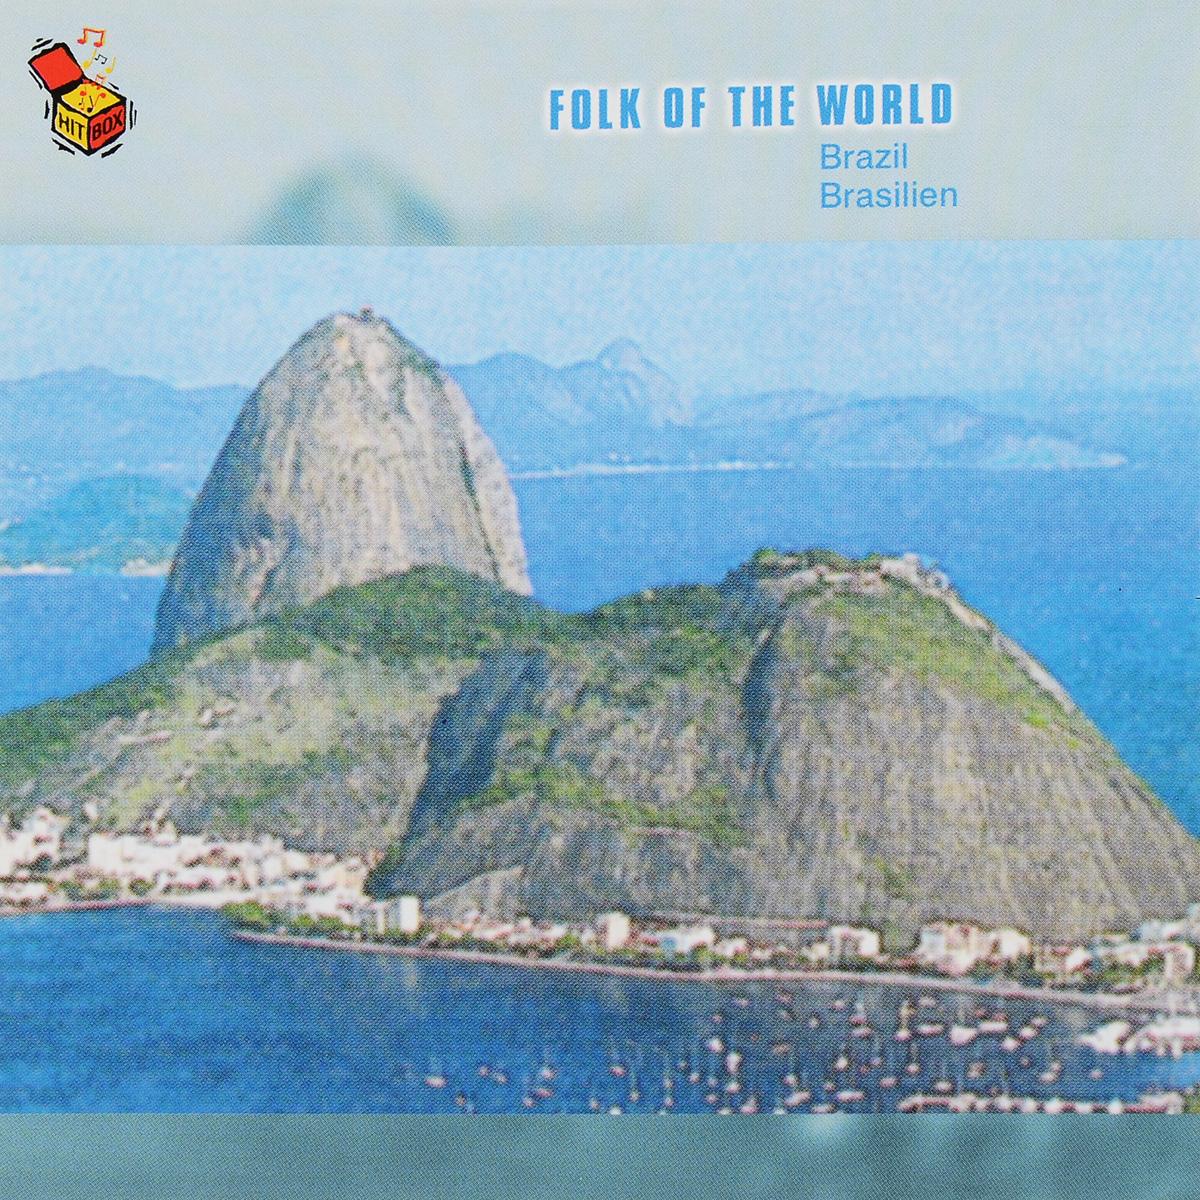 Folk Of The World. Brazil folk of the world brazil